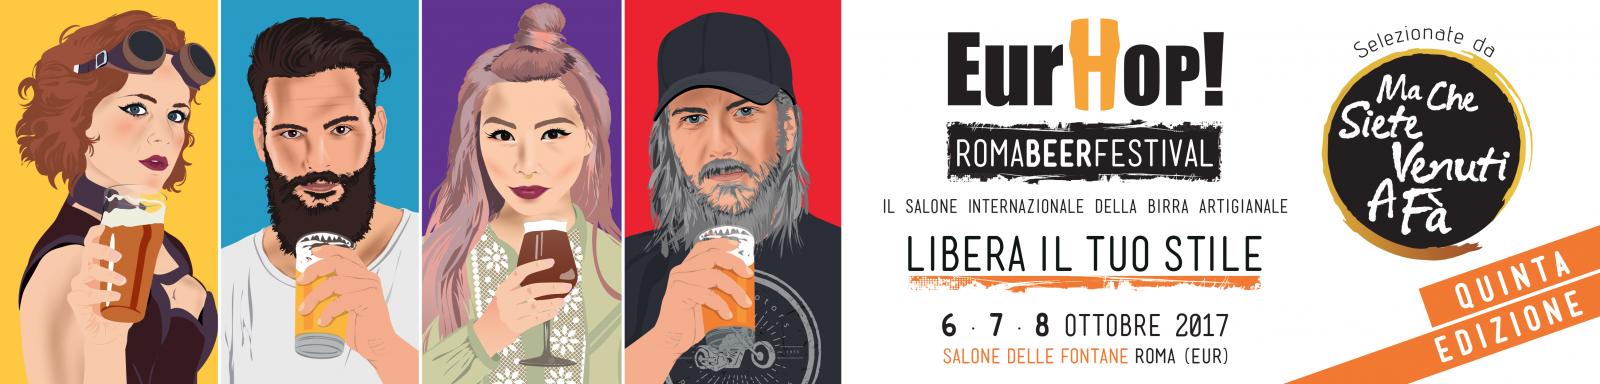 EurHop-Roma-Beer-Festival